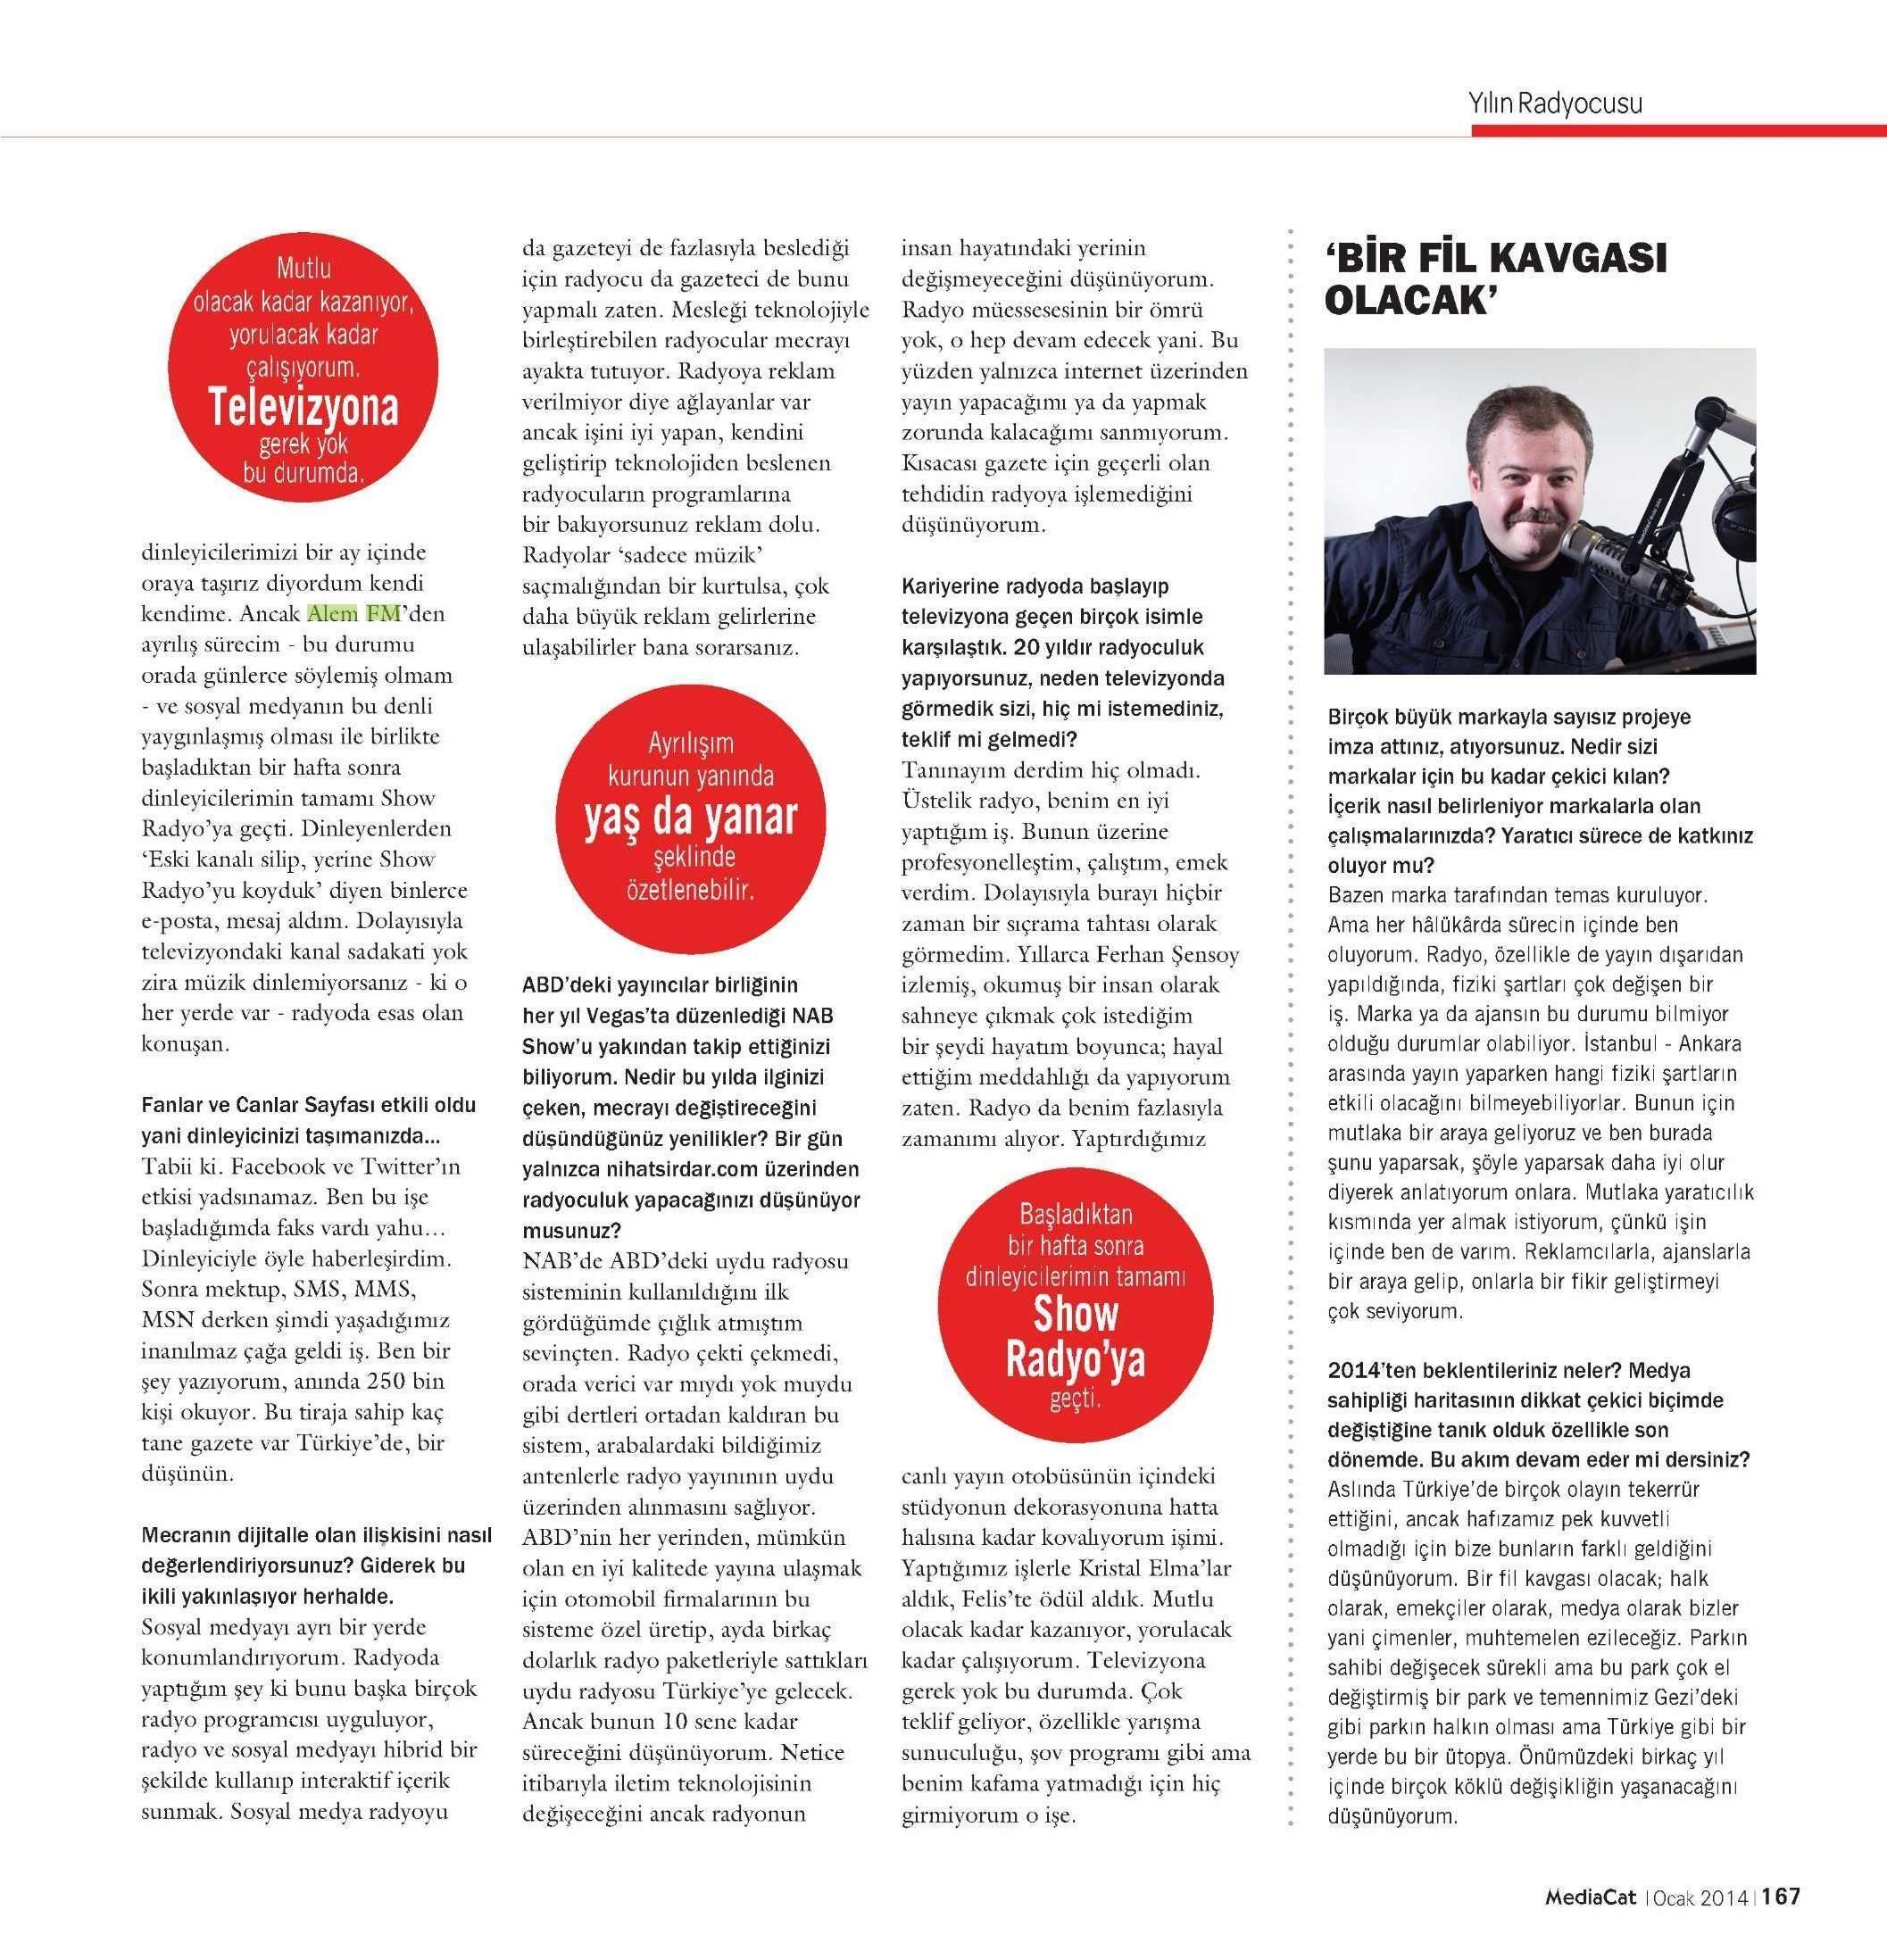 MediaCat Ocak 2014 Sayfa 3